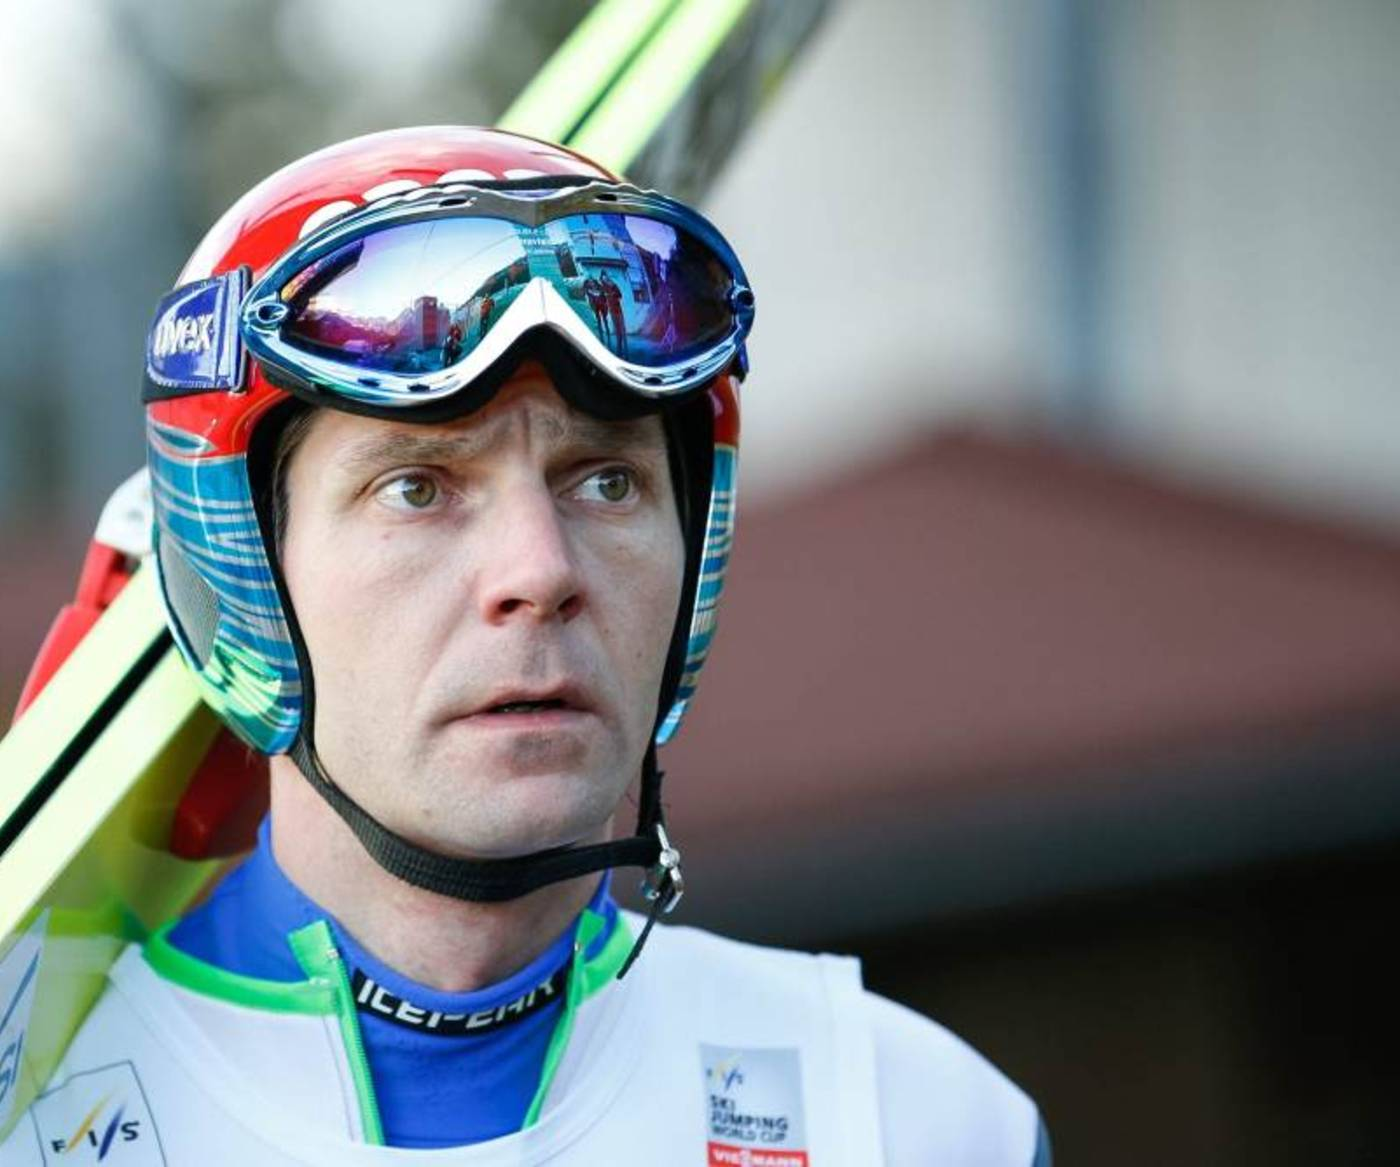 Янне Ахонен, urheilulehti.fi